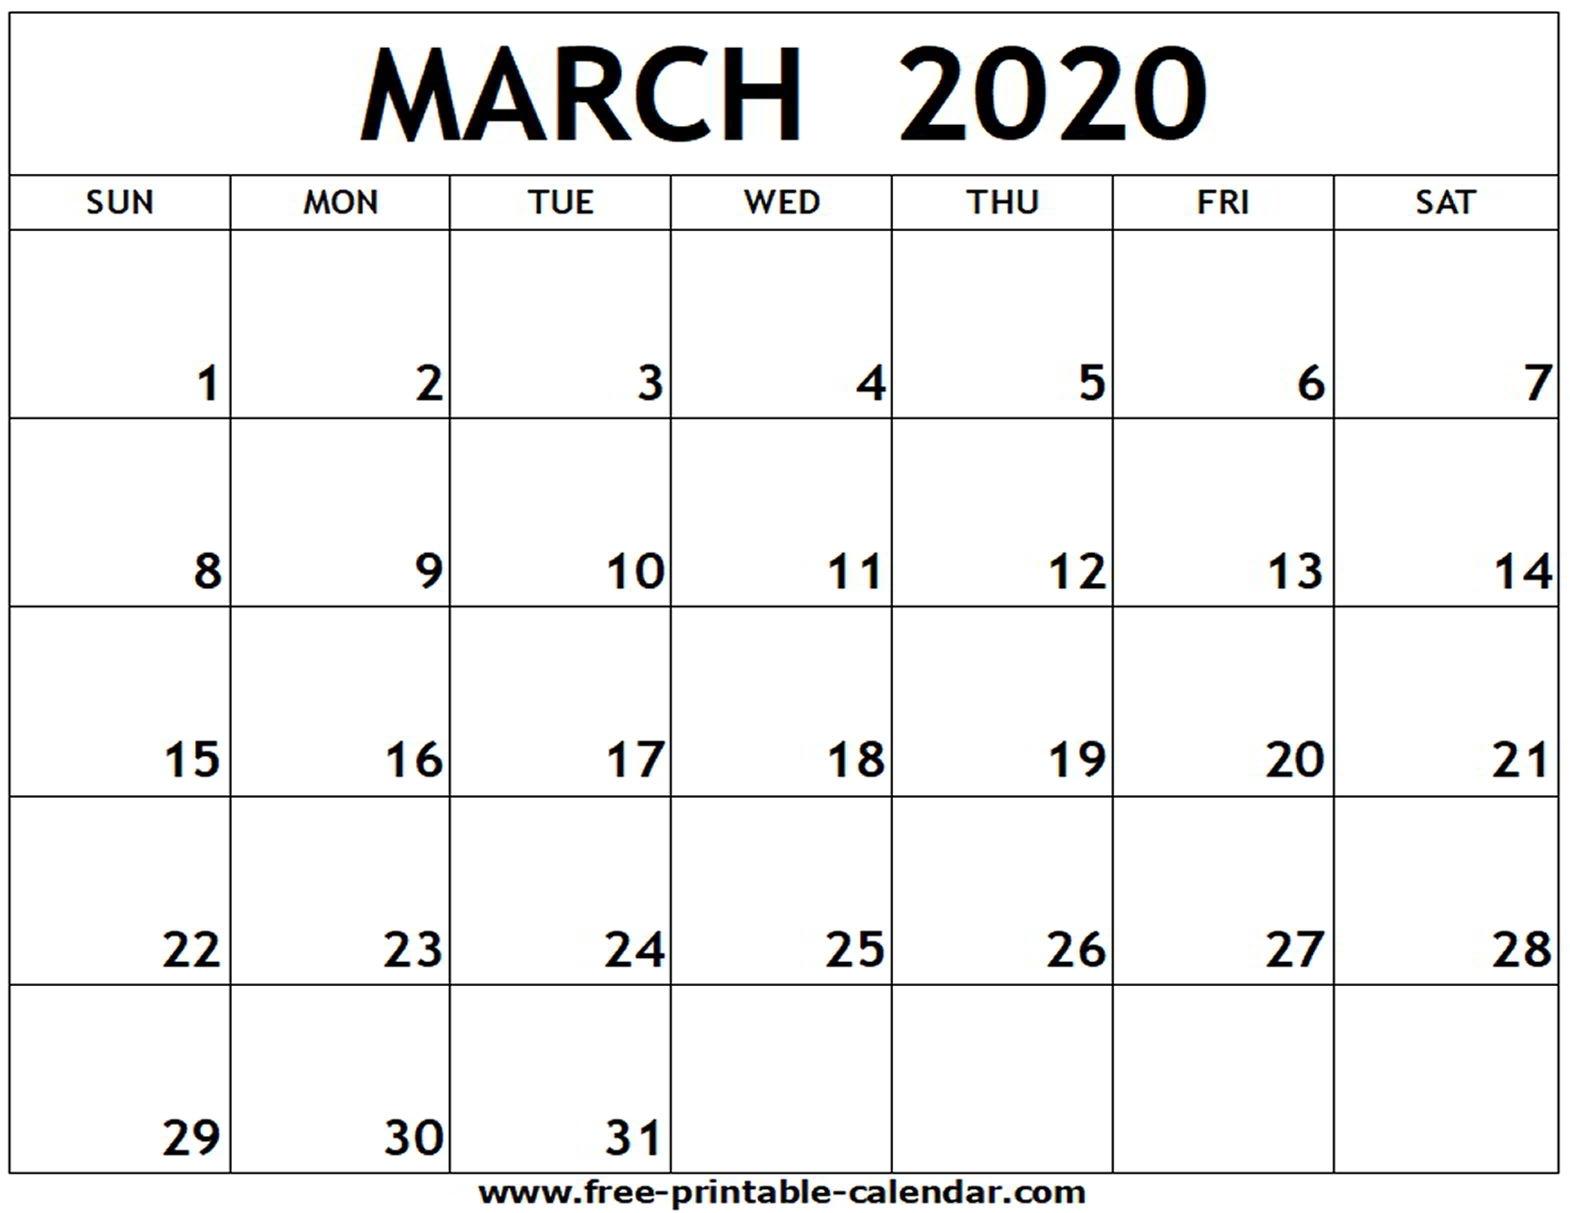 March 2020 Printable Calendar - Free-Printable-Calendar in 2020 Fill In Calendar